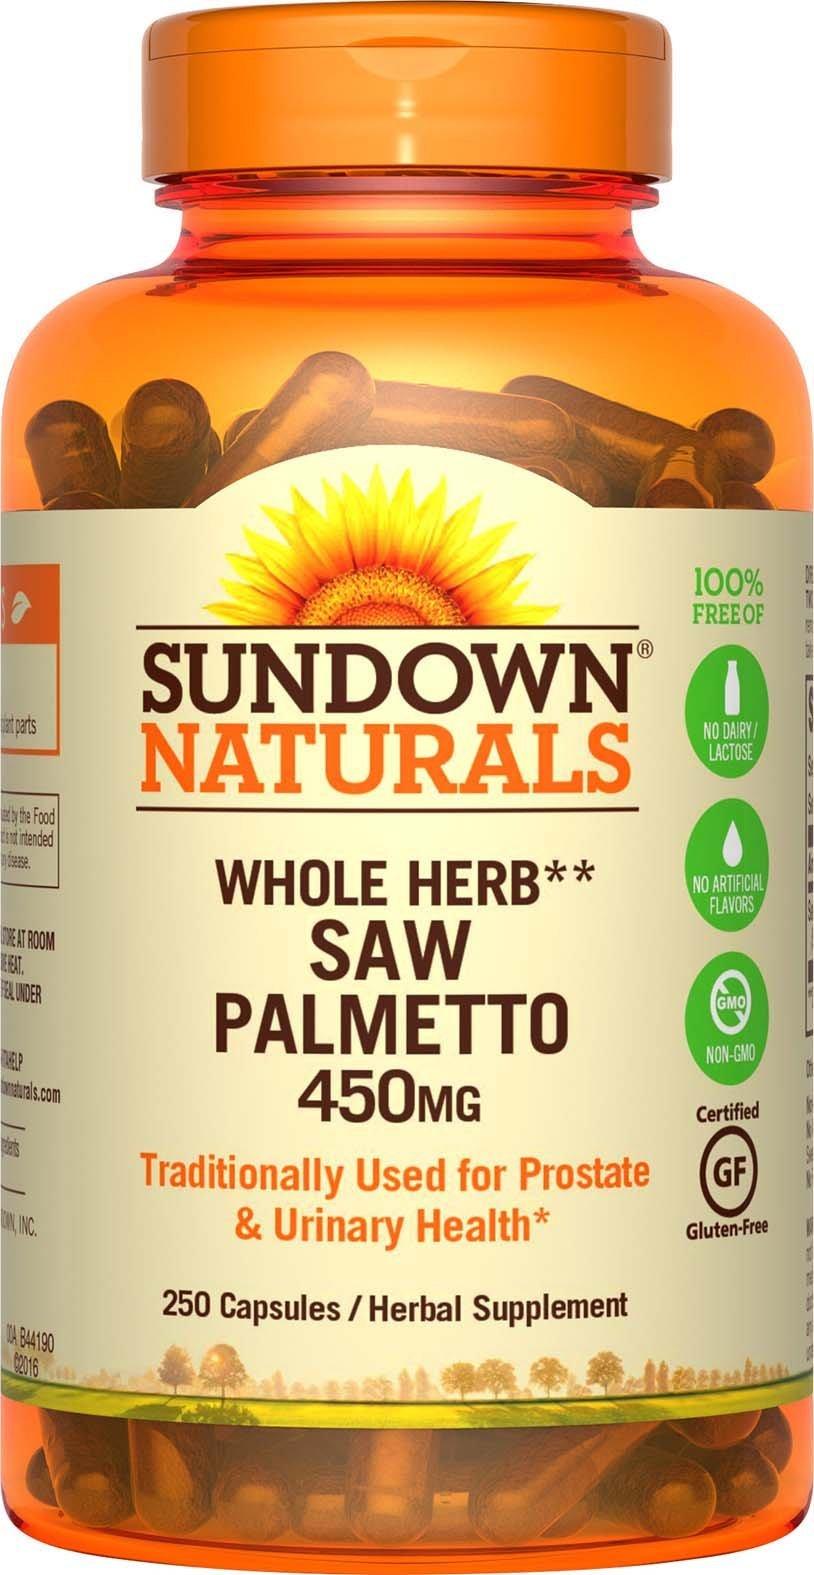 Sundown Naturals Saw Palmetto 450 mg, 250 Capsules by Sundown Naturals